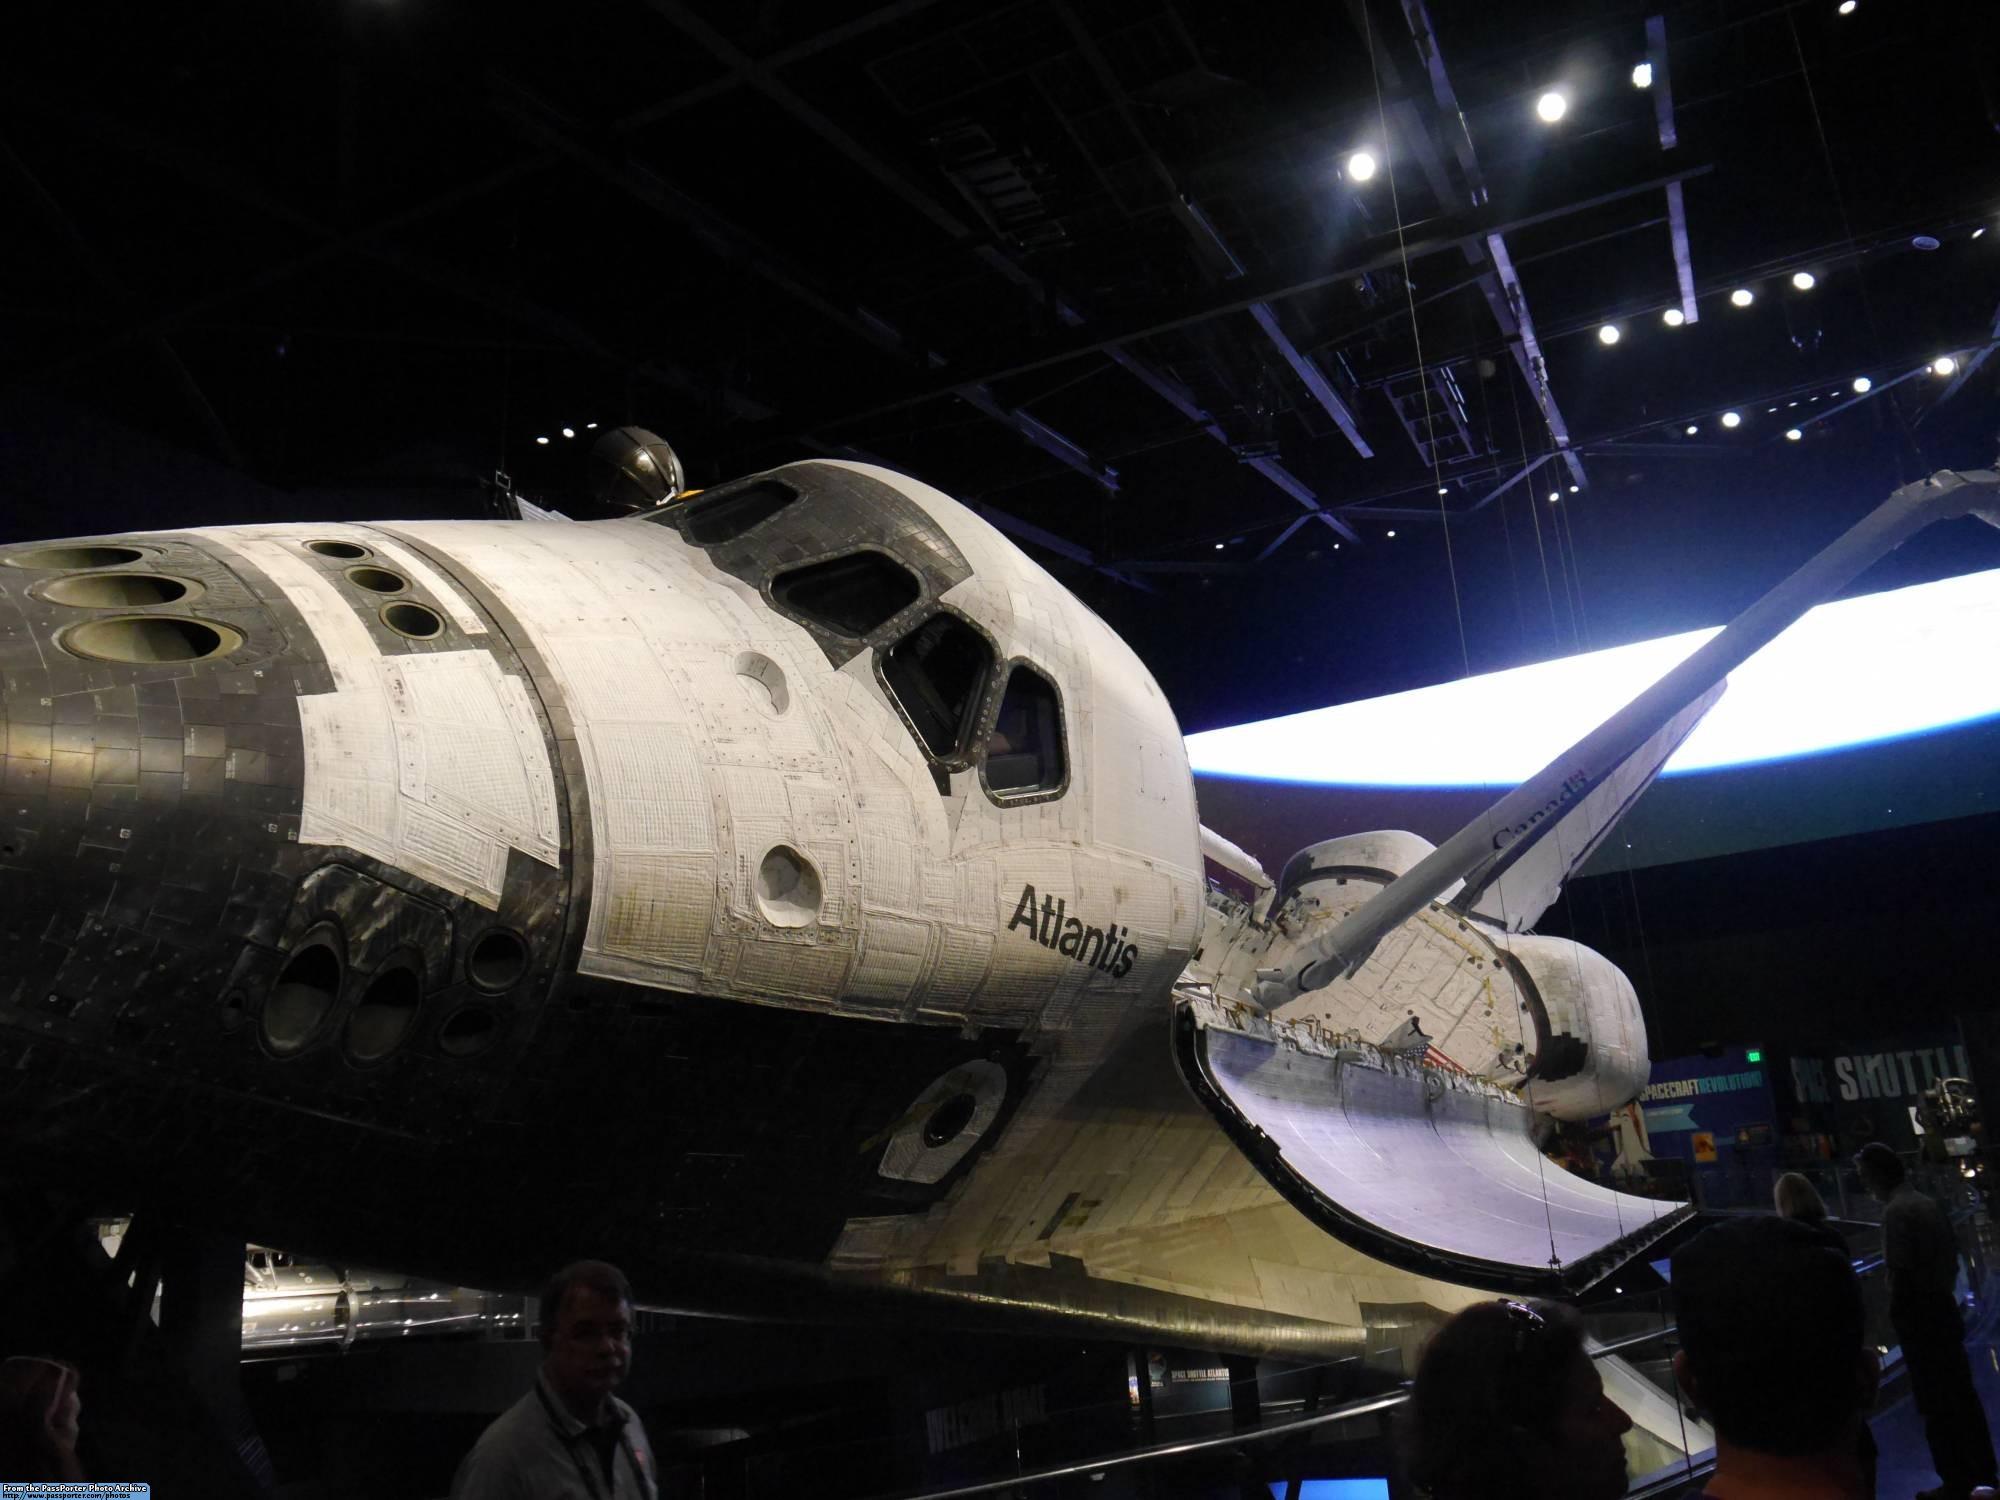 Explore Kennedy Space Center in Cape Canaveral, Florida |PassPorter.com